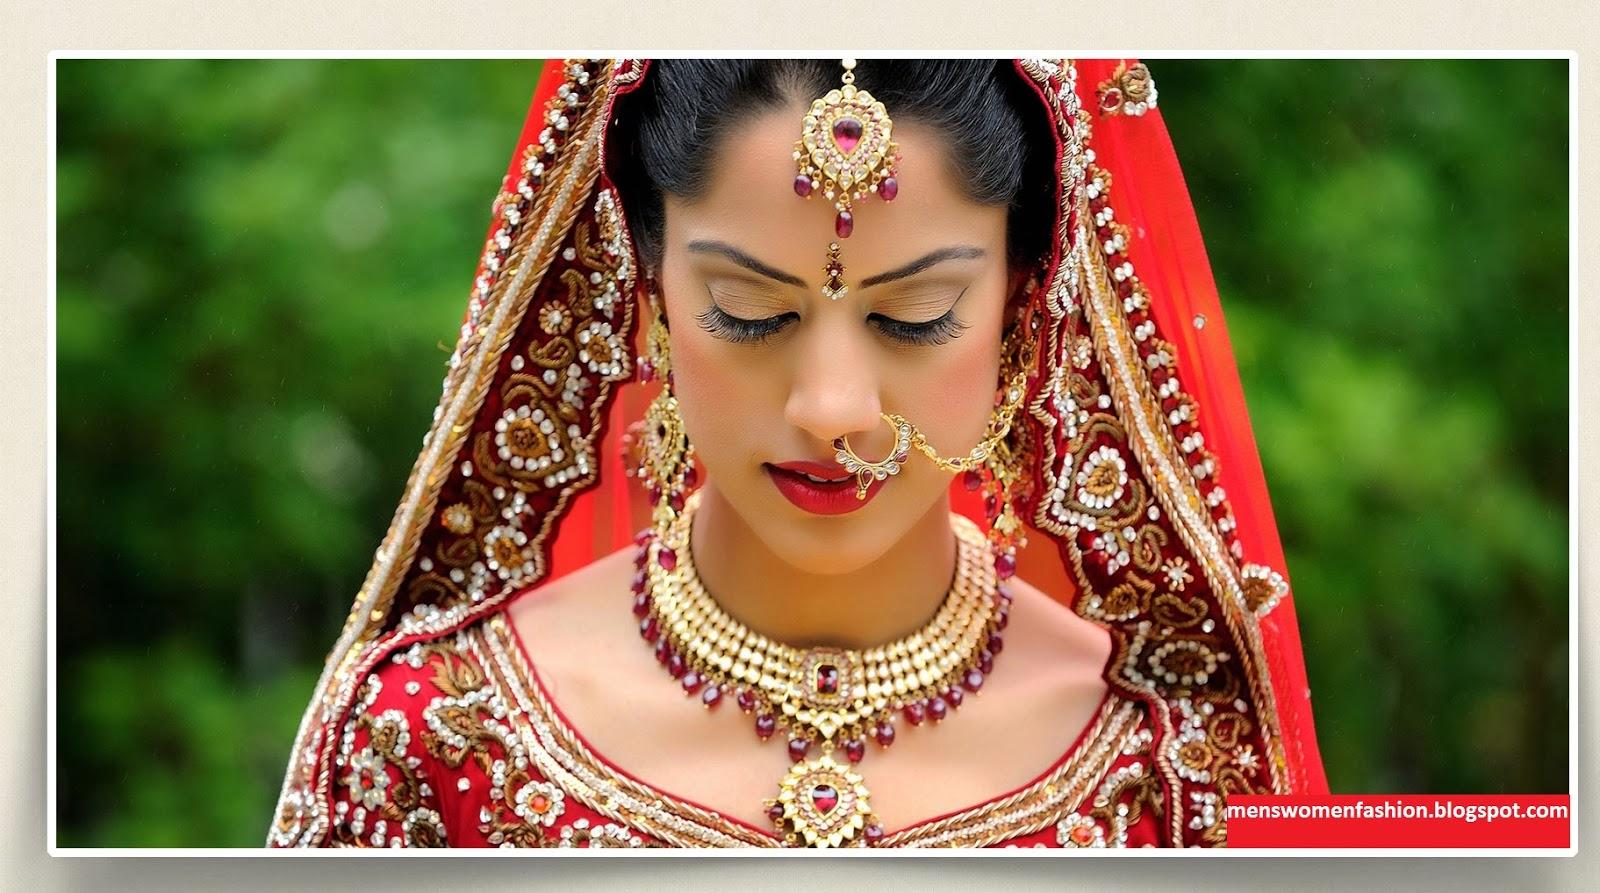 Latest Bridal Weddings Stylish Jewelry For Girls - Sari Info